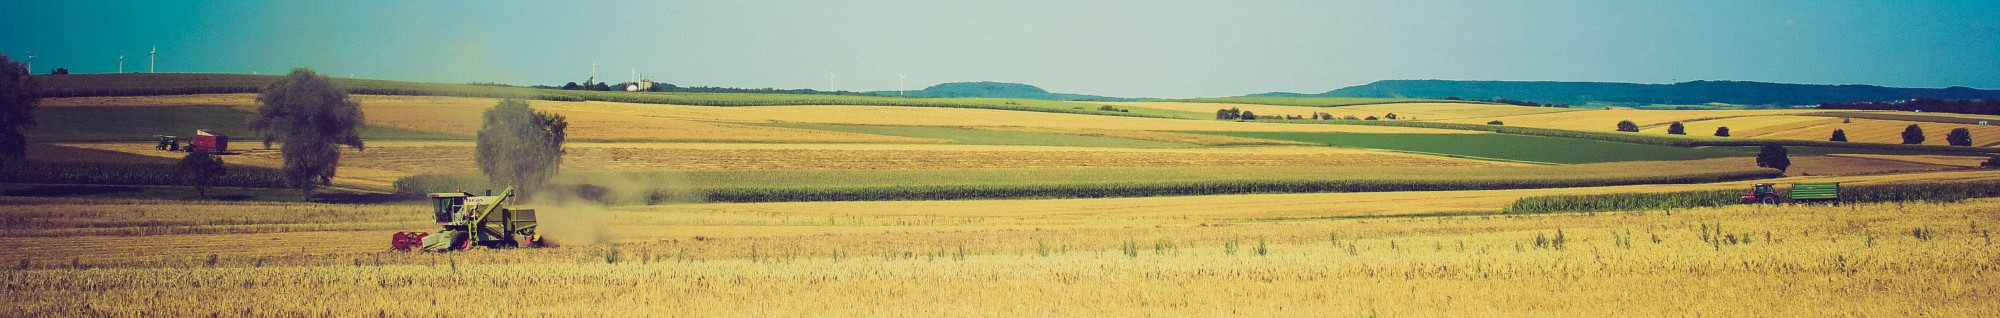 Farm Insurance - Farming